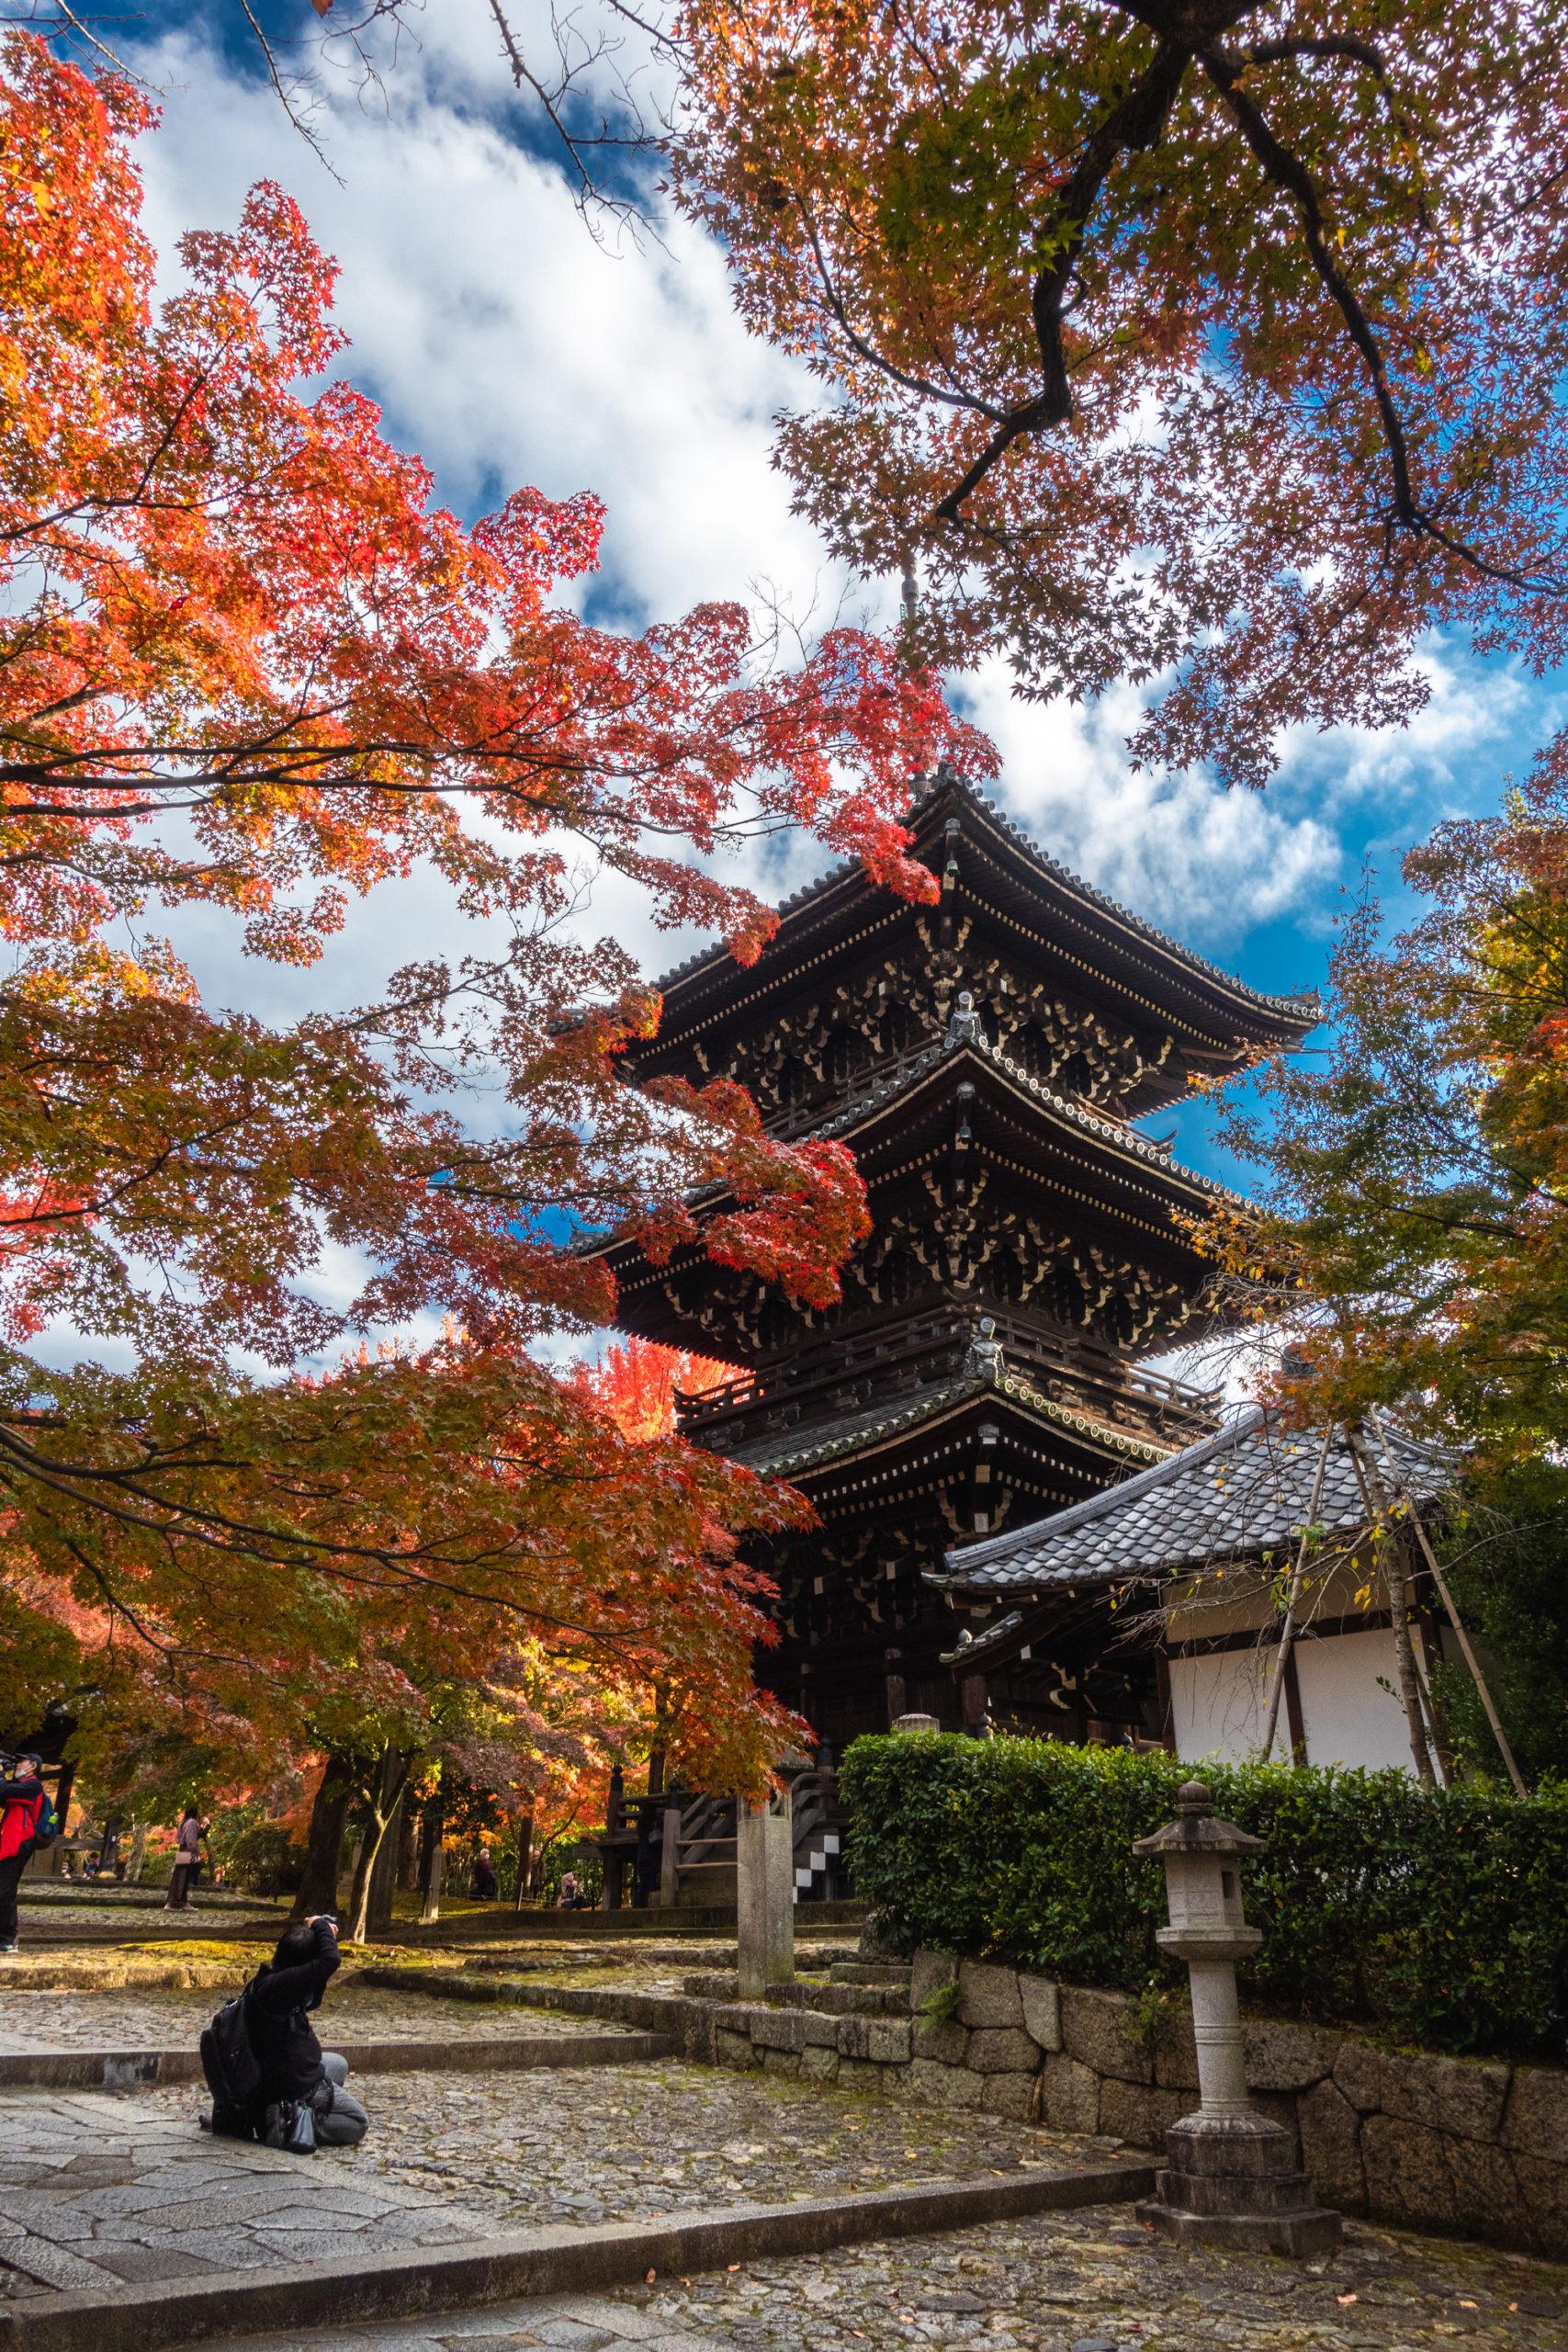 DSC00813-scaled 京都  真如堂(三重塔と紅葉の風情を感じる景色が美しい秋におすすめのスポット!撮影した写真の紹介、アクセス情報など)